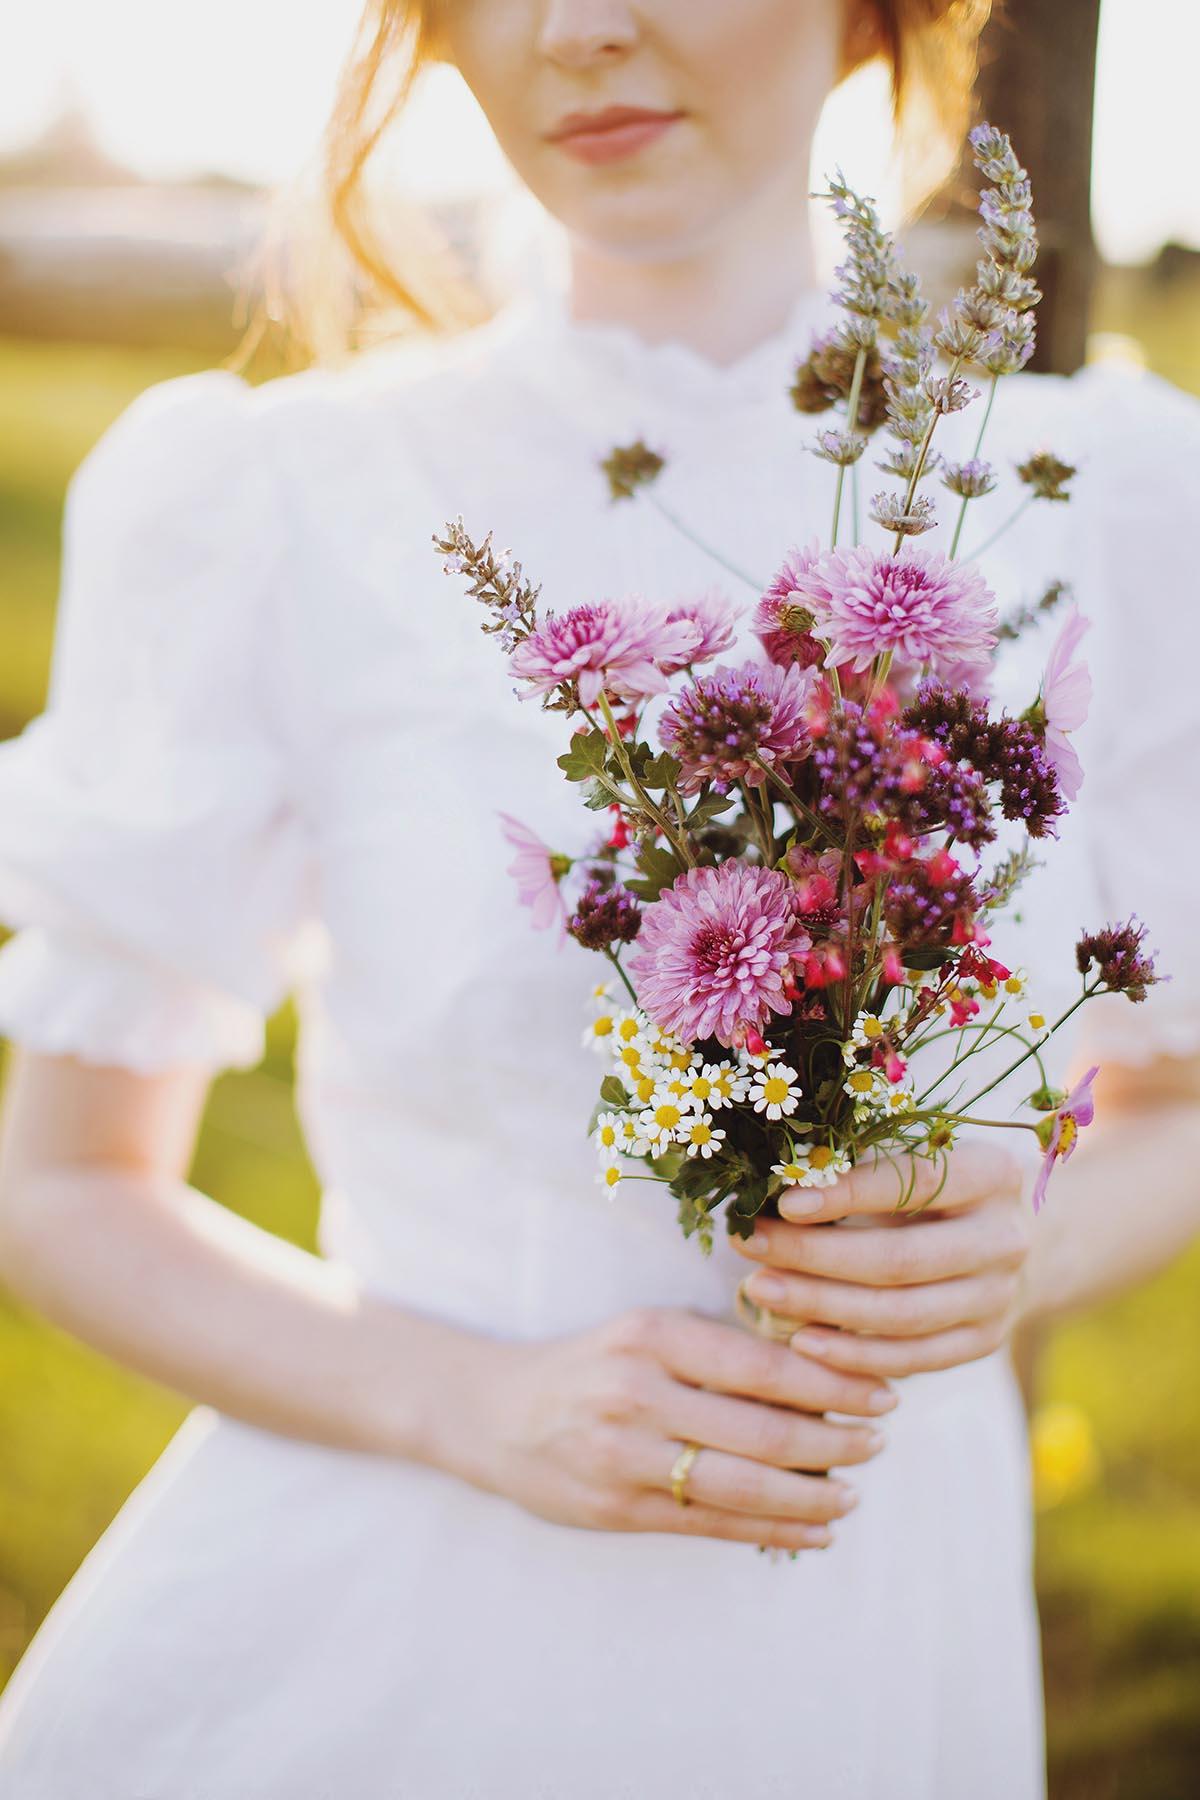 Styled Shoot VINTAGE von POUR TOI – Nadine Budja